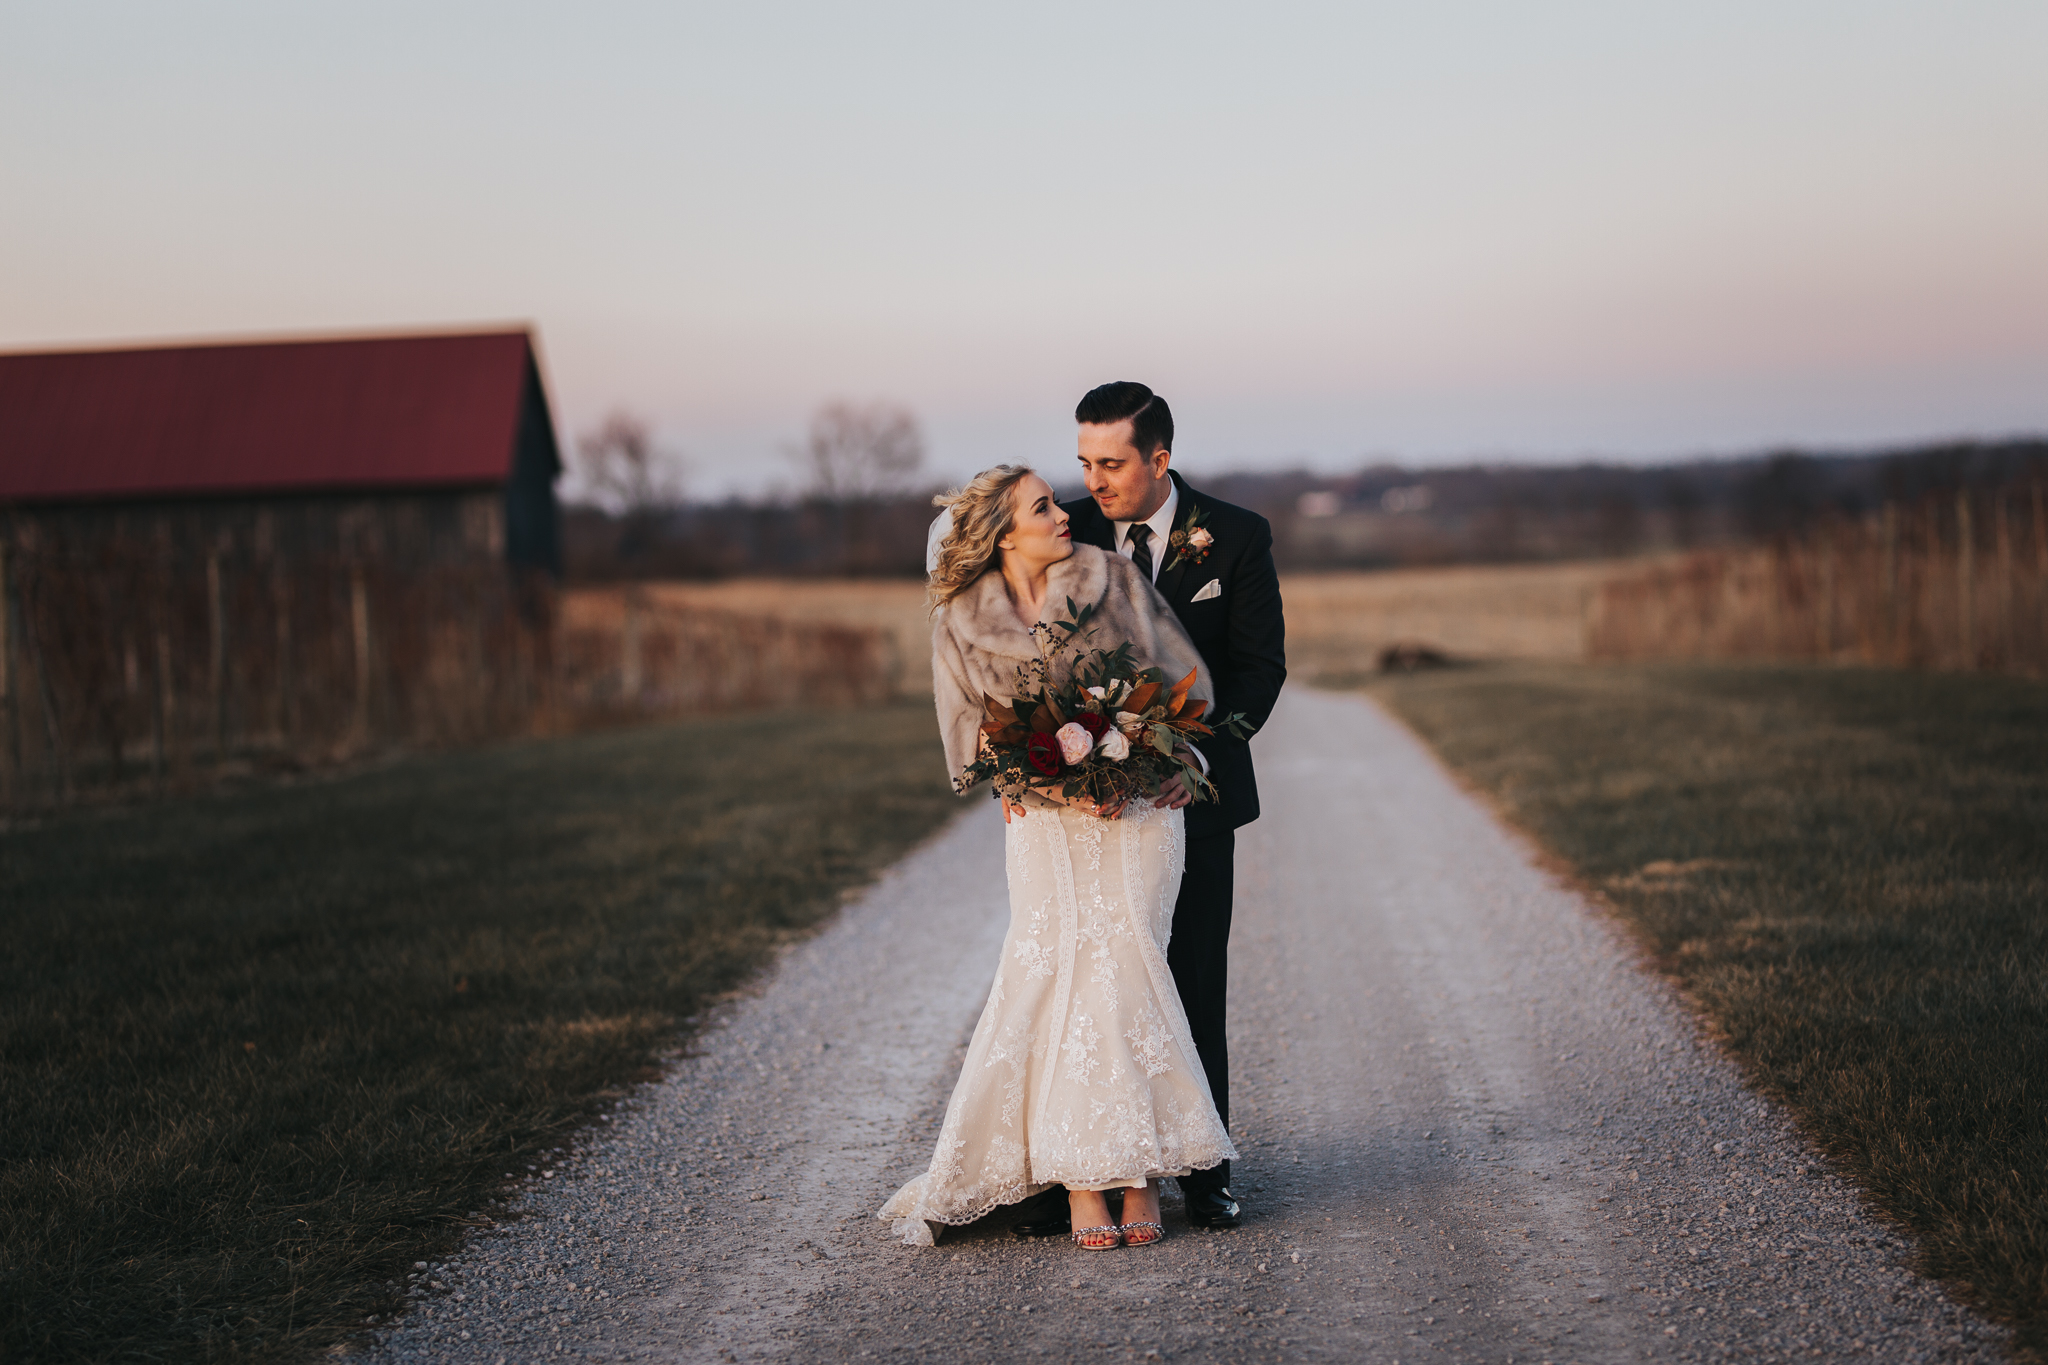 0098 Ariana Jordan Photo - Cameron & Lauren's Wedding at Talon Winery  4264.jpg